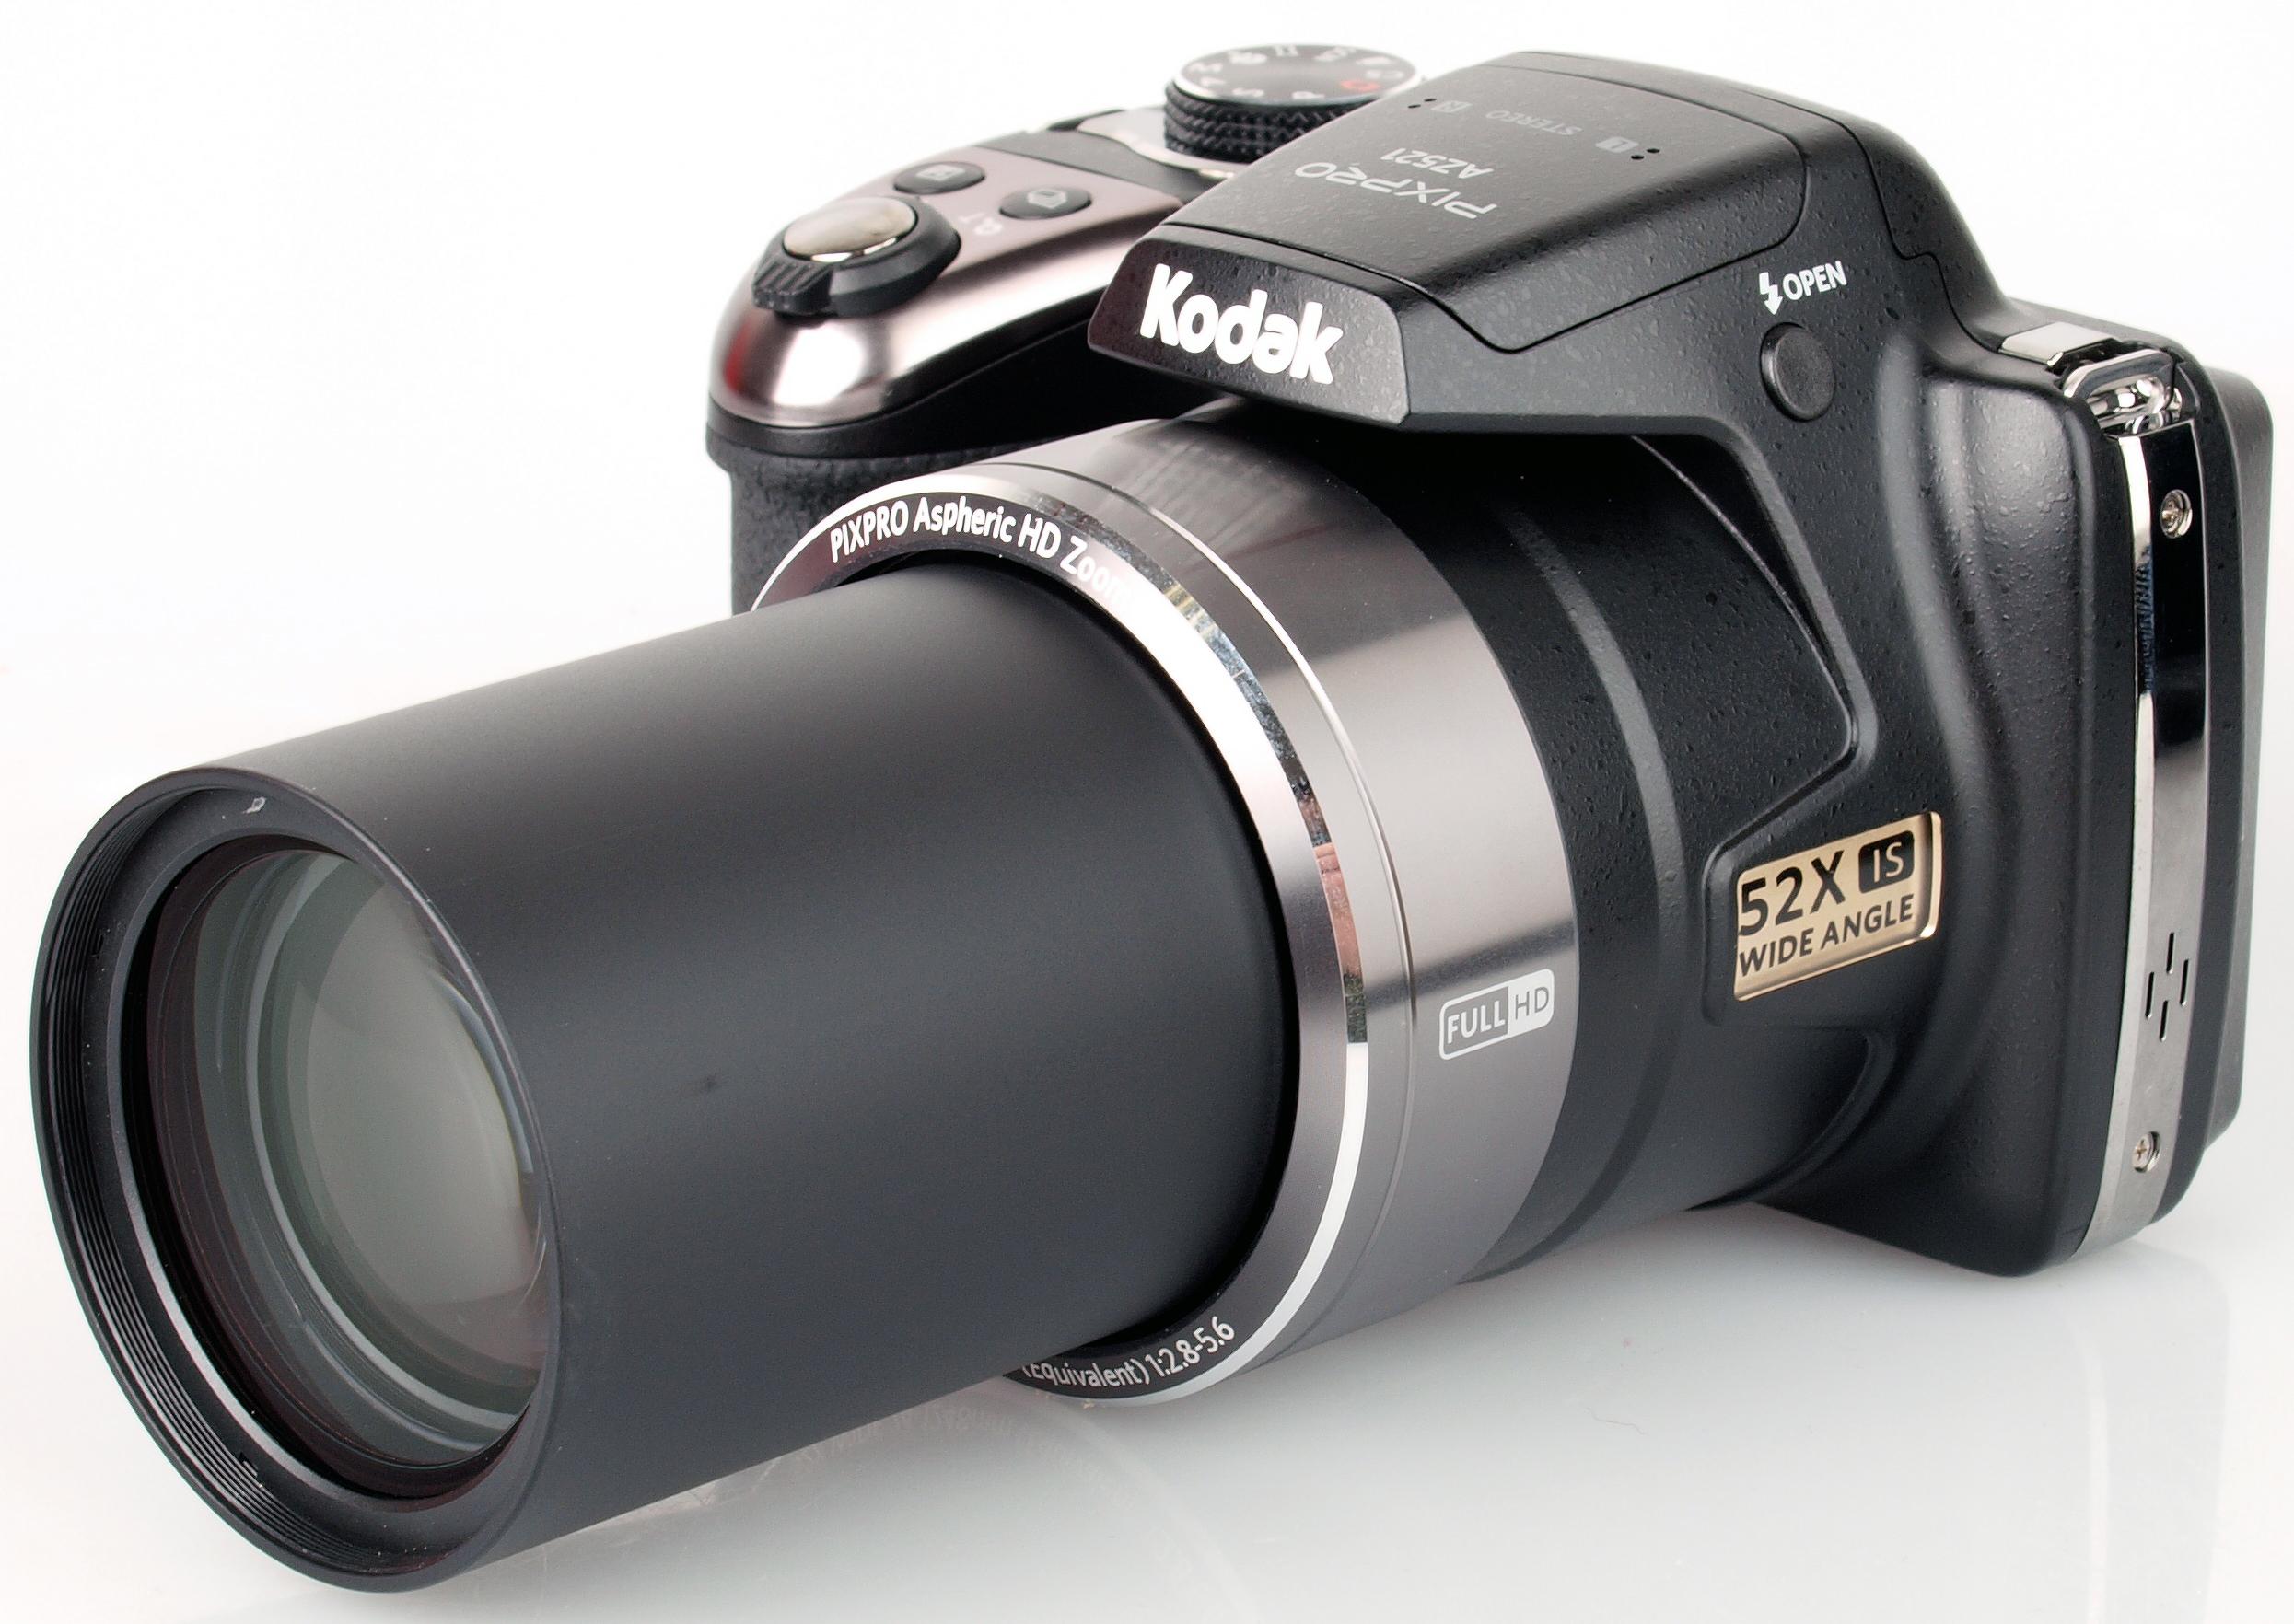 Digital kodak camera black pictures, sex homeless porn